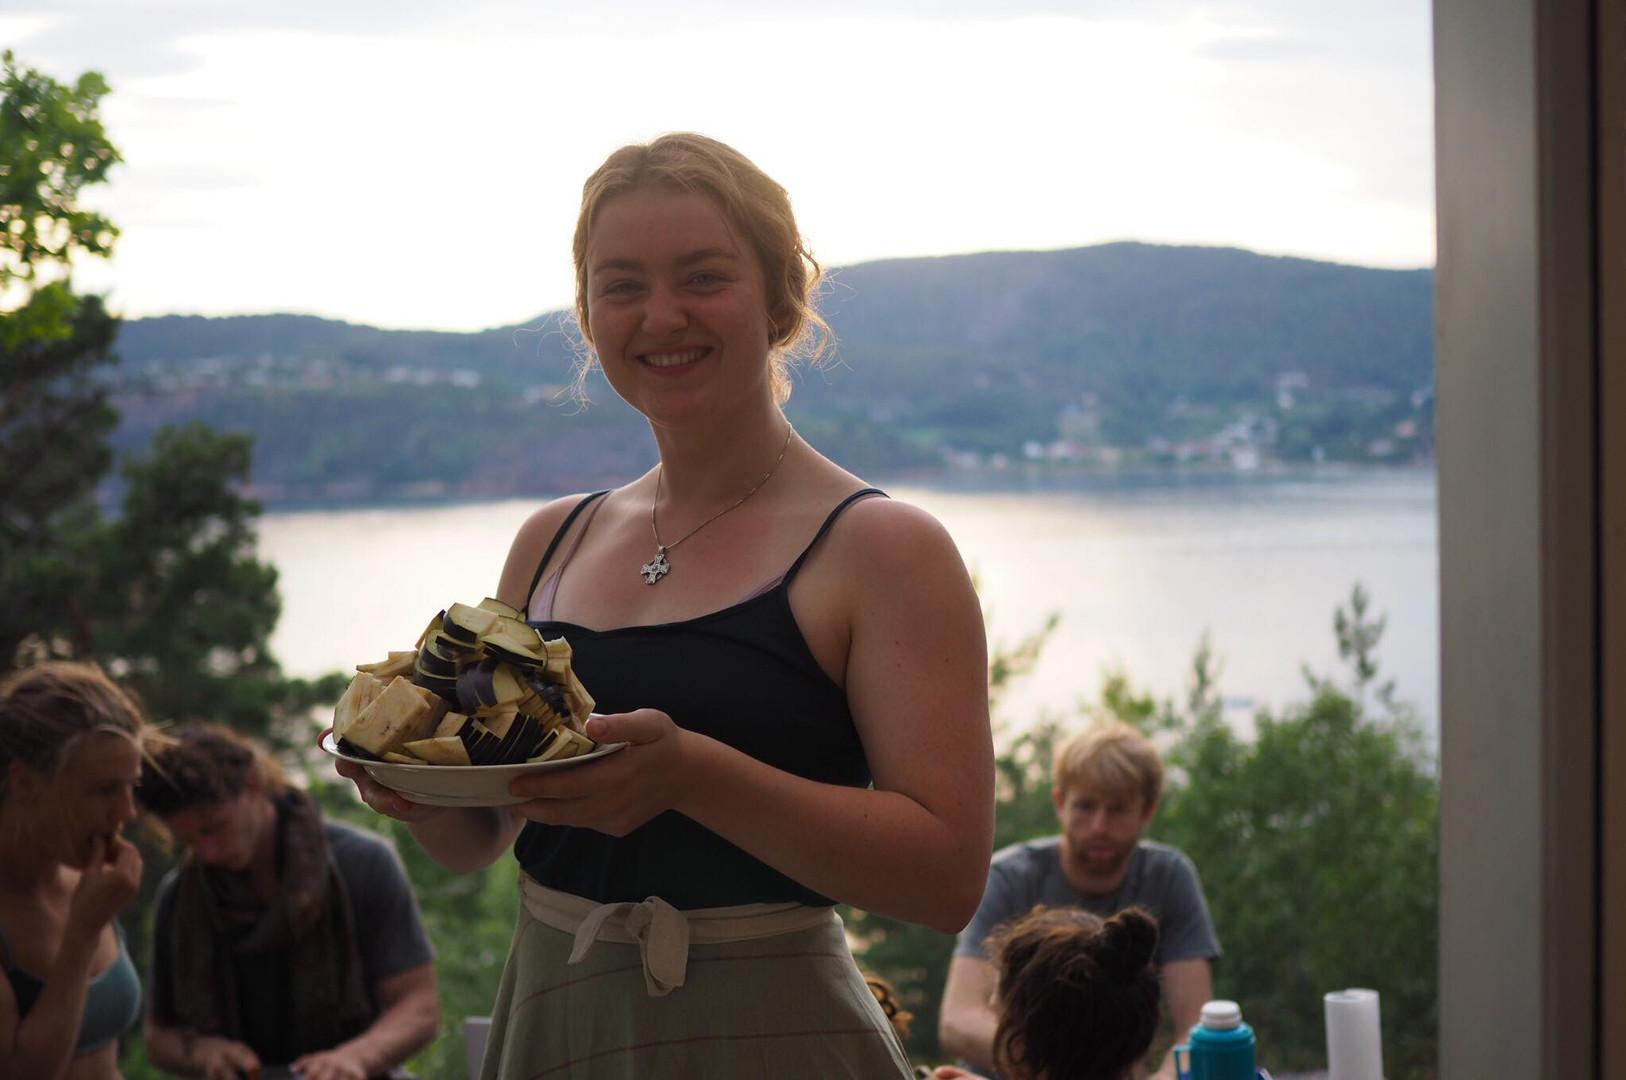 Zelda cooking delisious vegan food for the workshop team